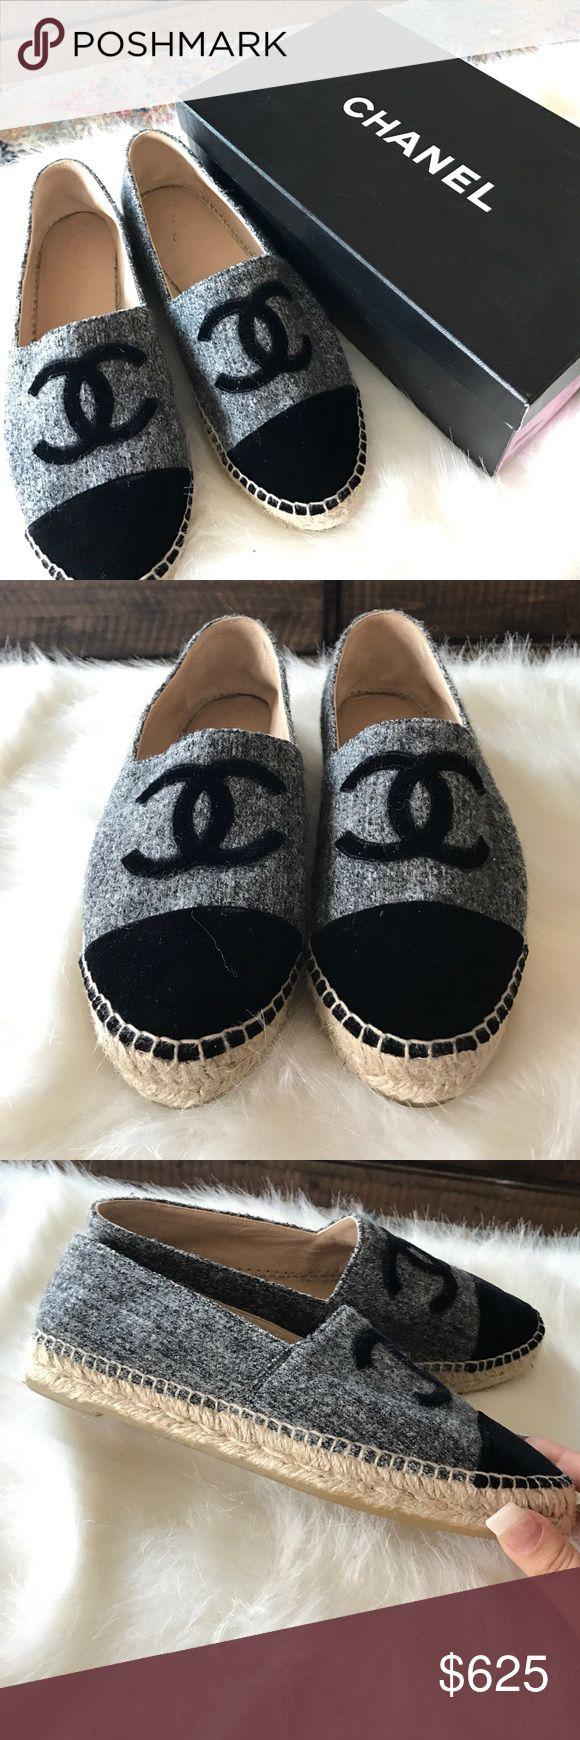 Chanel Espadrilles Beige / Black. Lamb skin, worn twice CHANEL Shoes Espadrilles